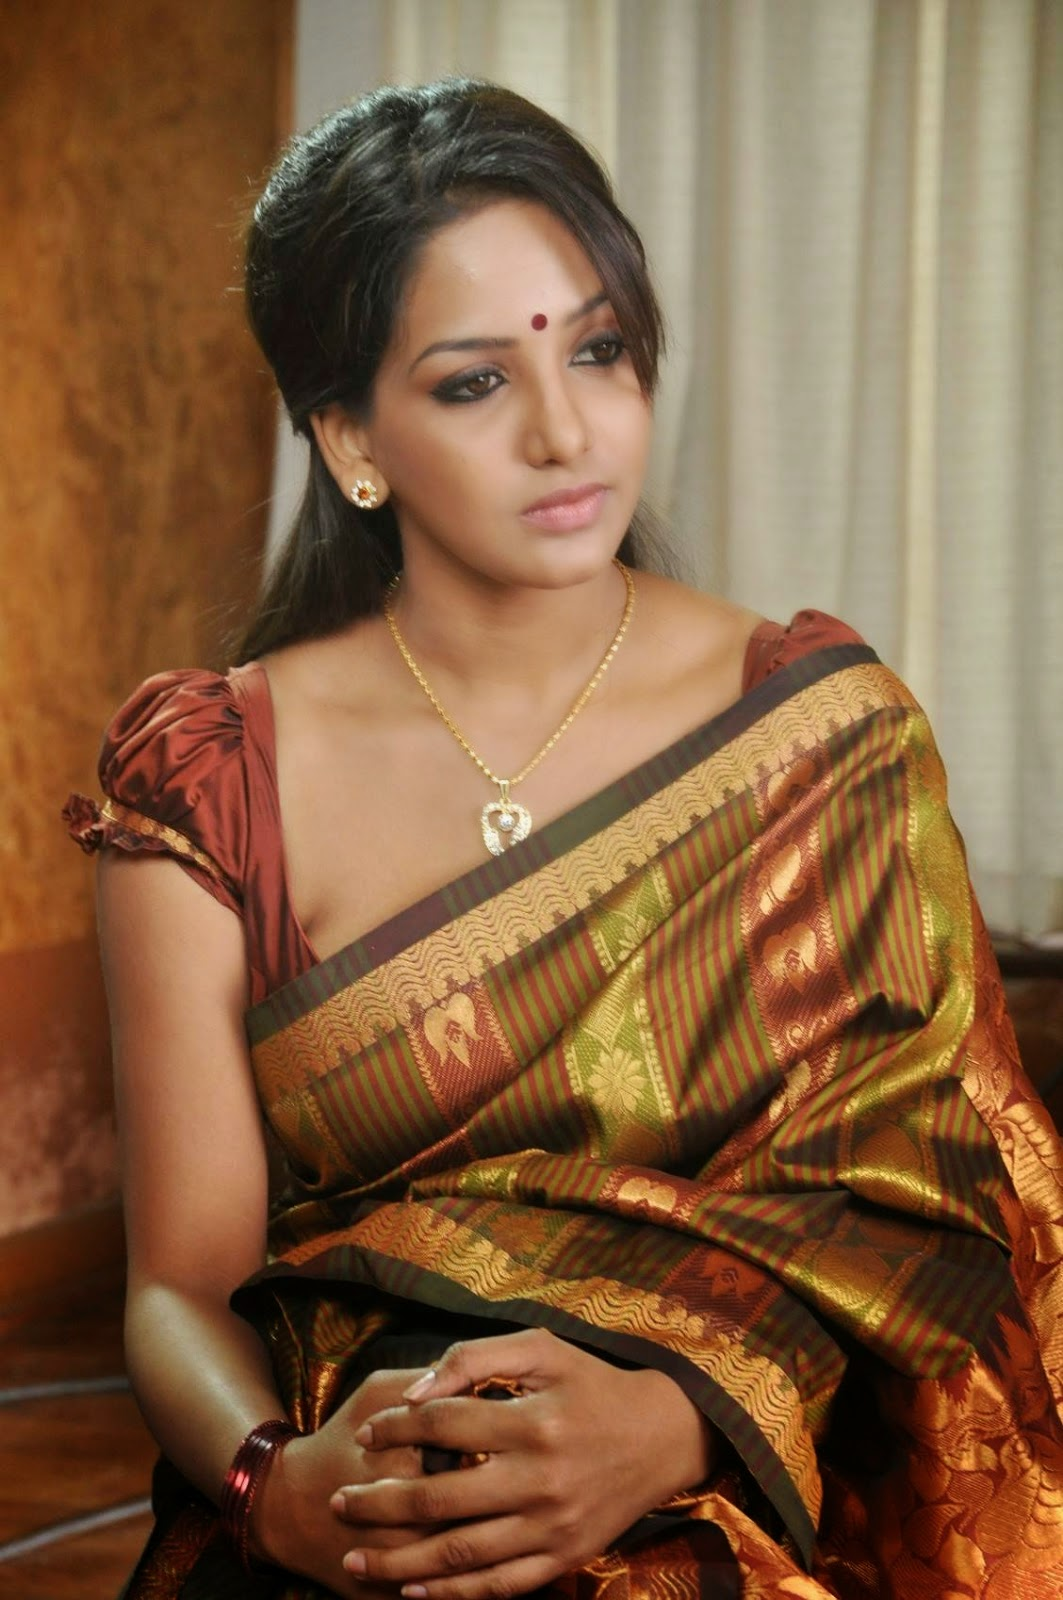 bhavani reddy stills from ini avane tamil movie bhavani